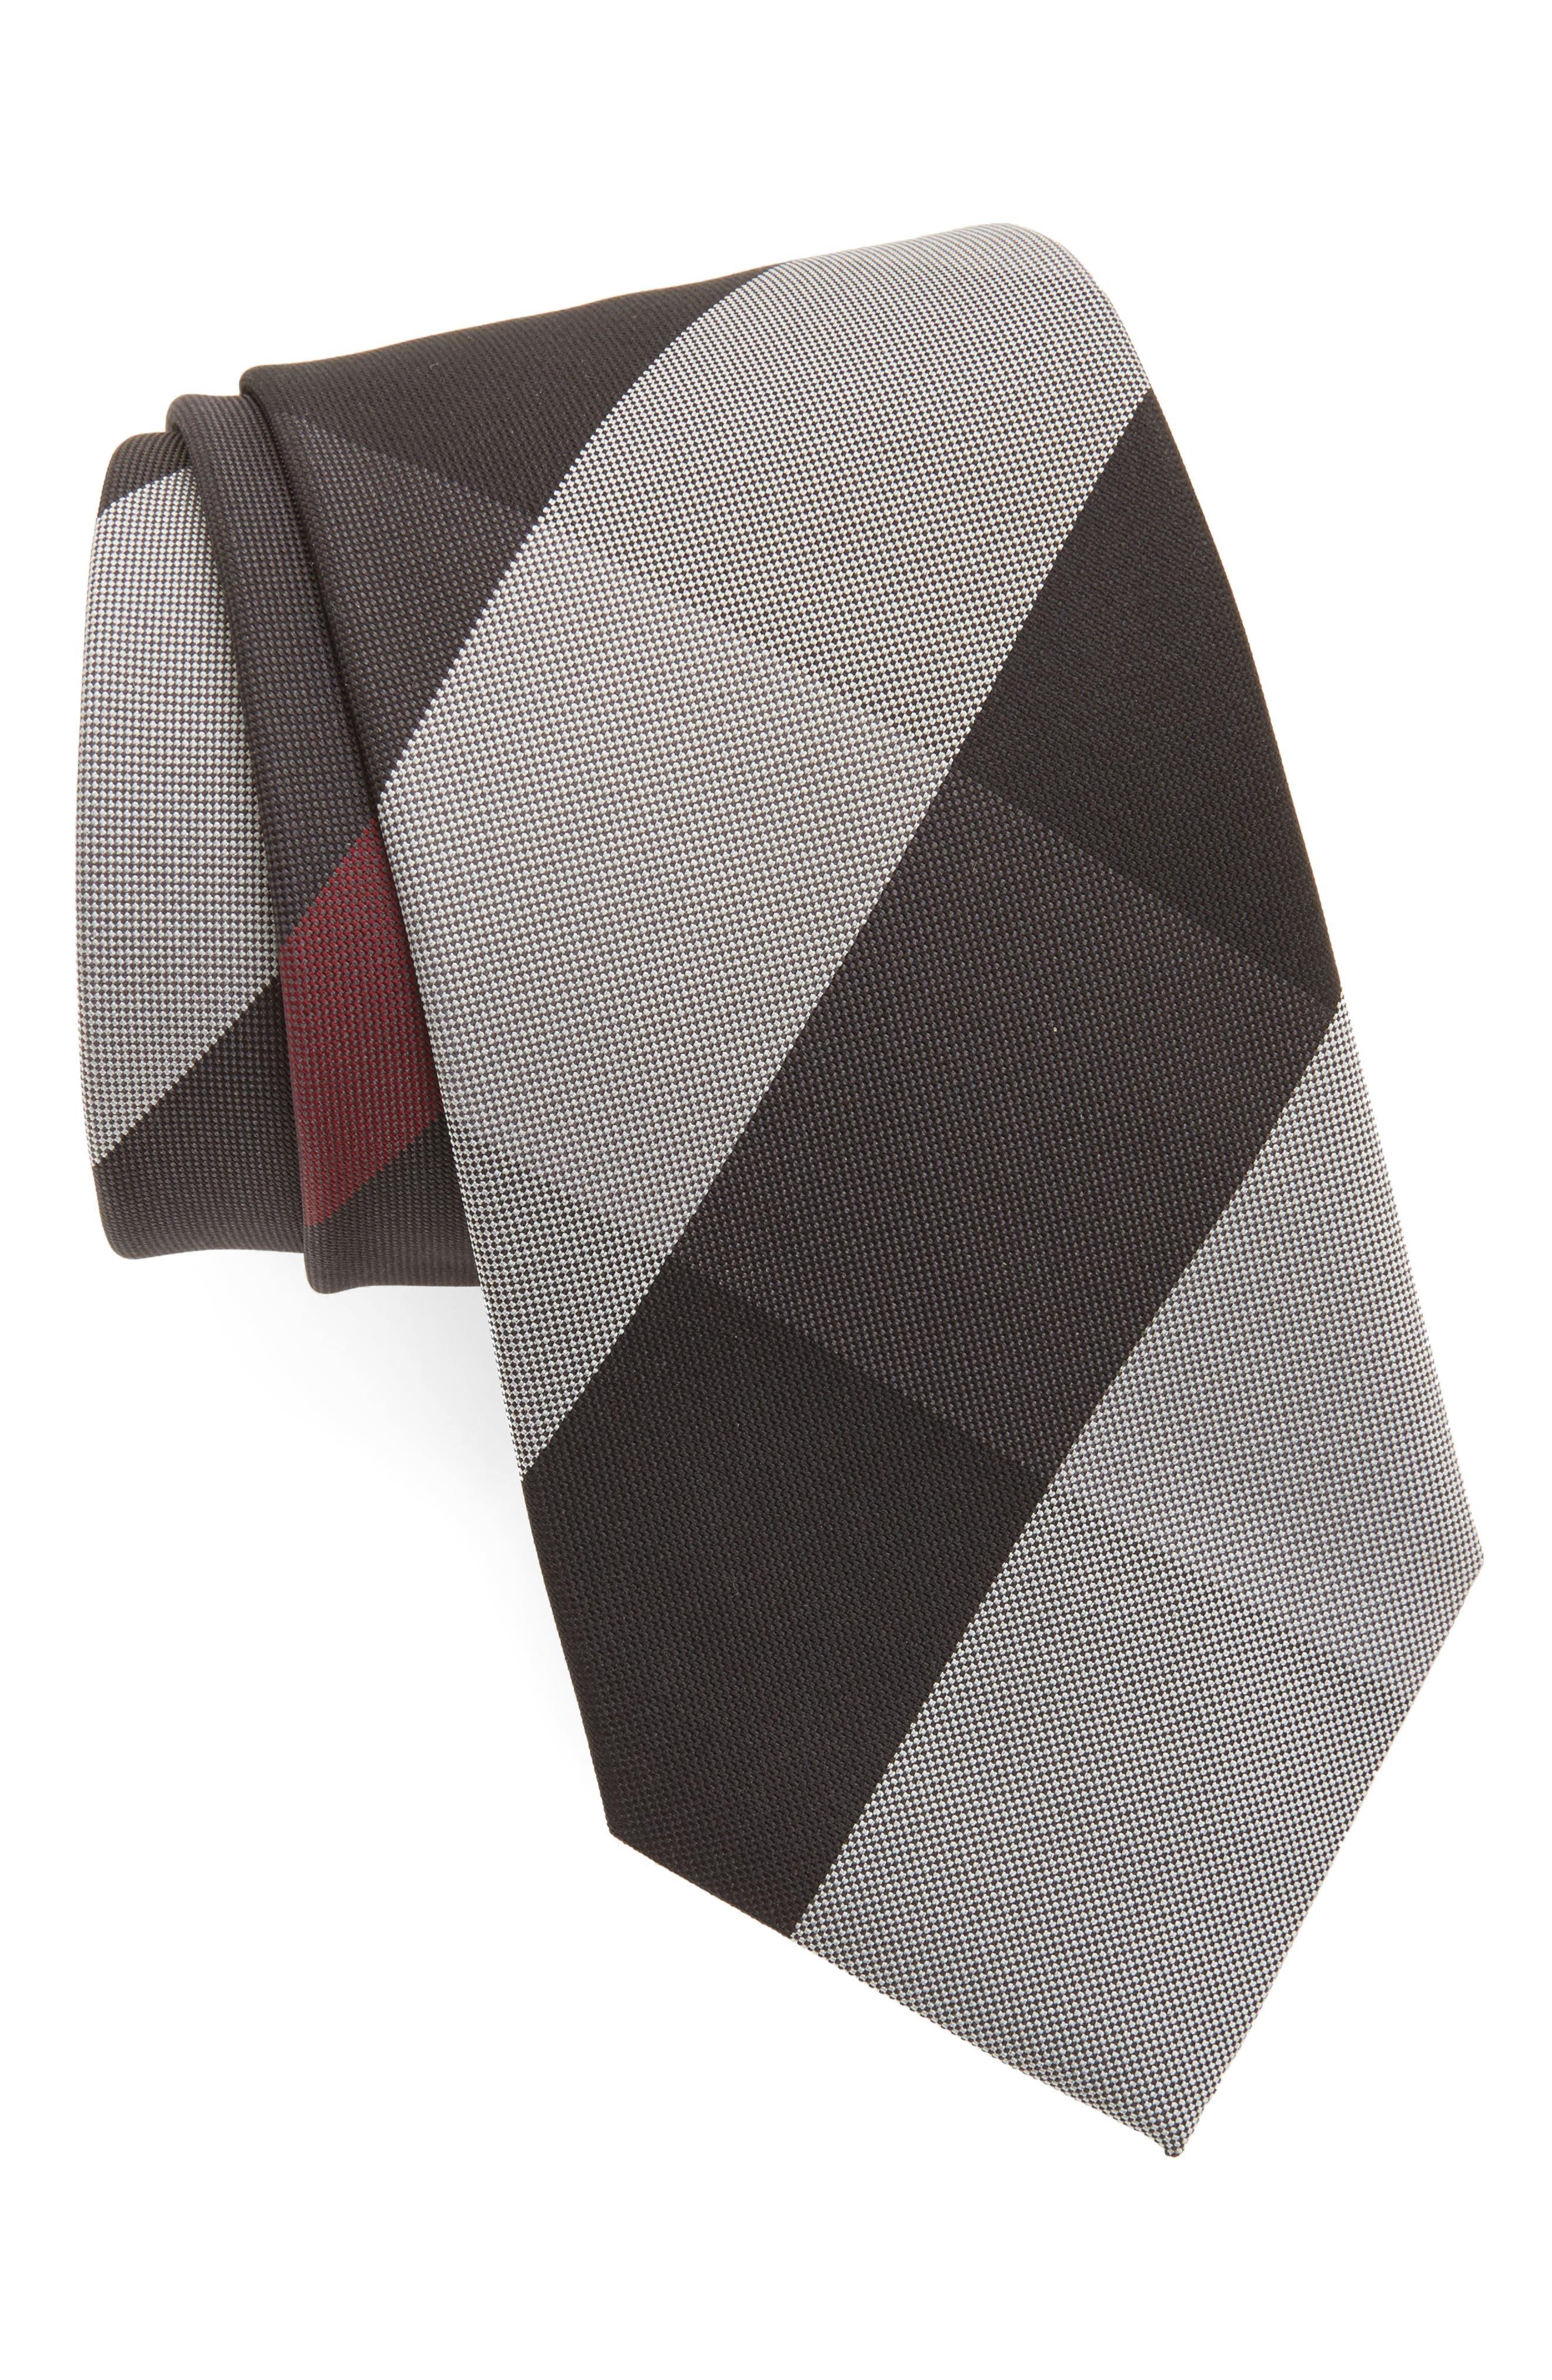 Clinton Silk Tie,                             Main thumbnail 1, color,                             026